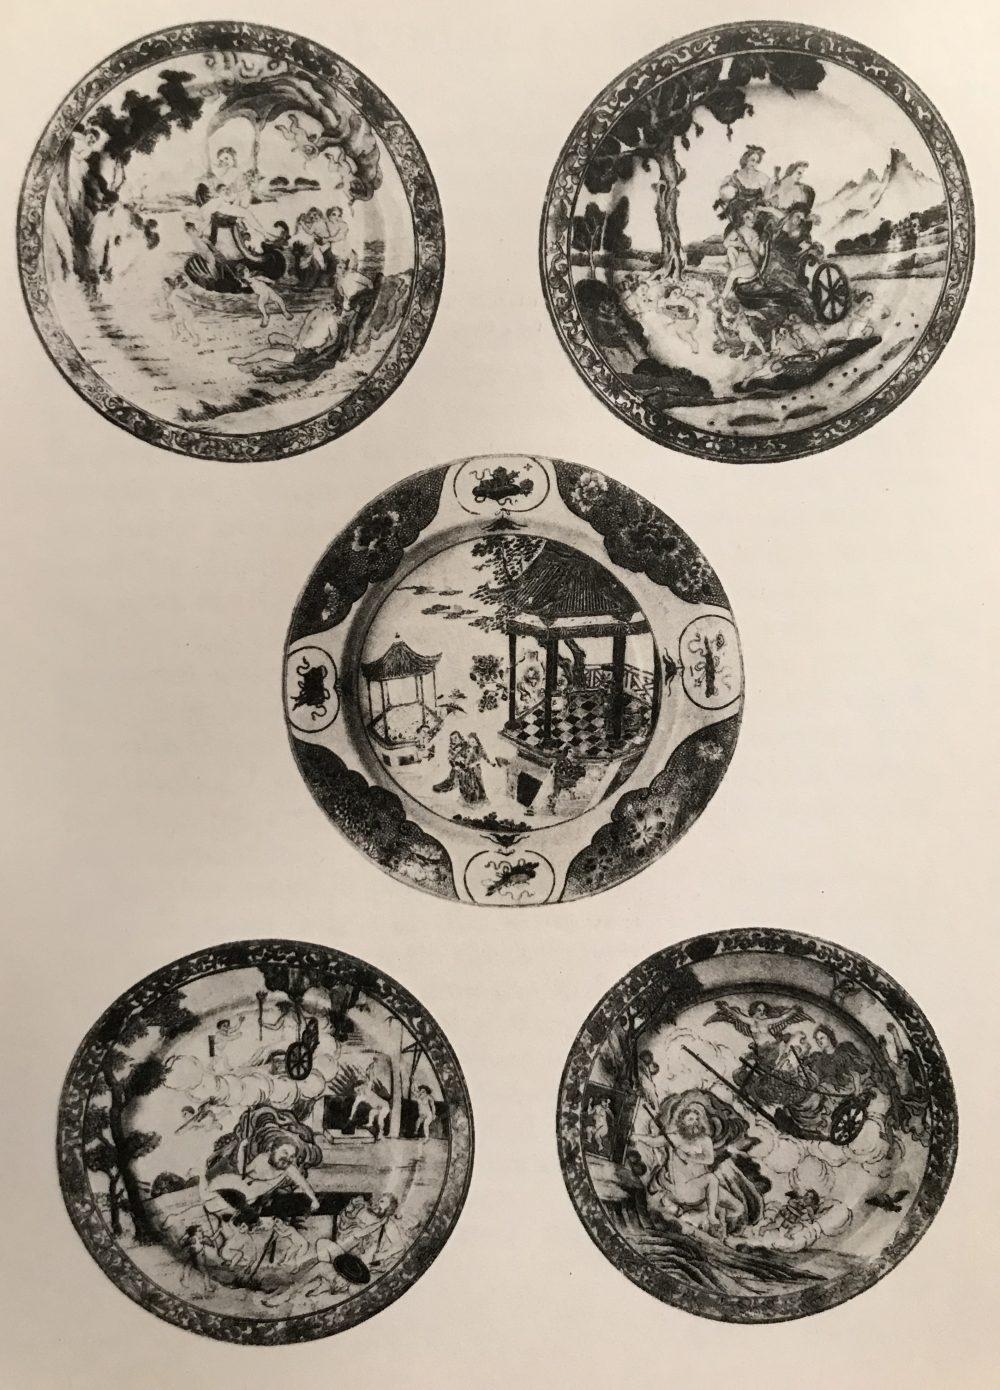 Porcelaine Qianlong (1735-1795), circa 1742, Chine